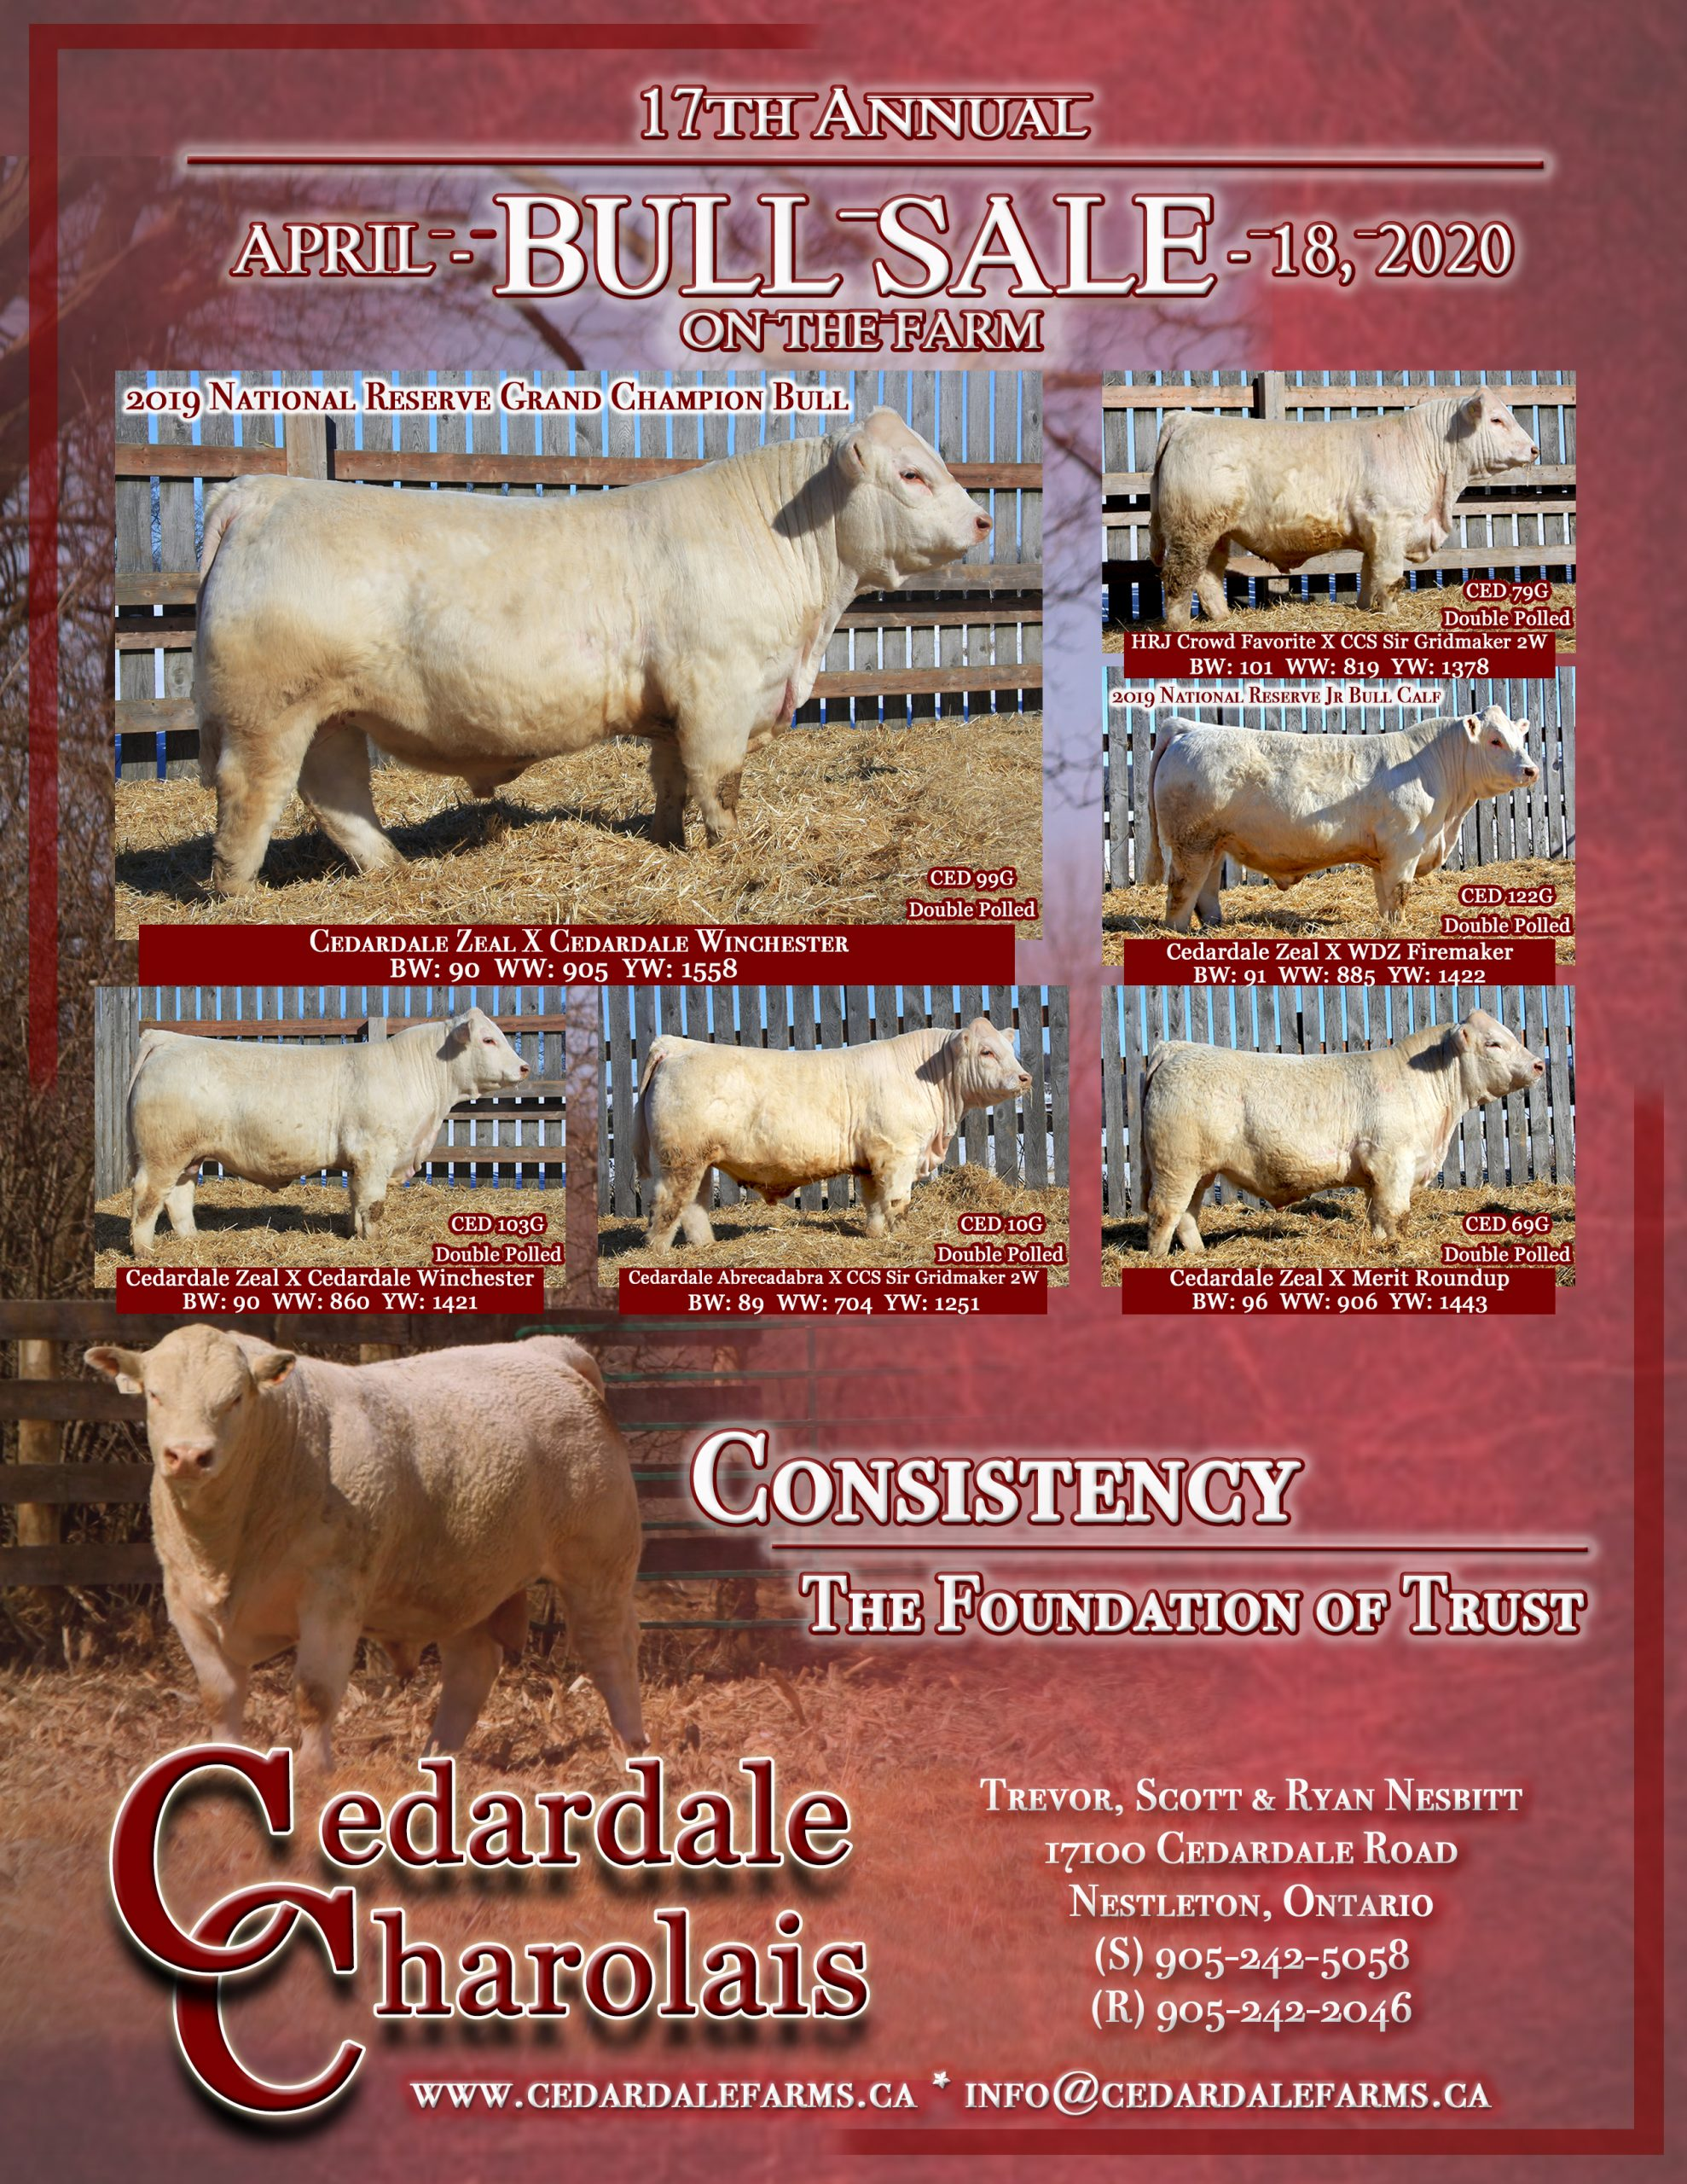 Bull Sale 2020 Poster